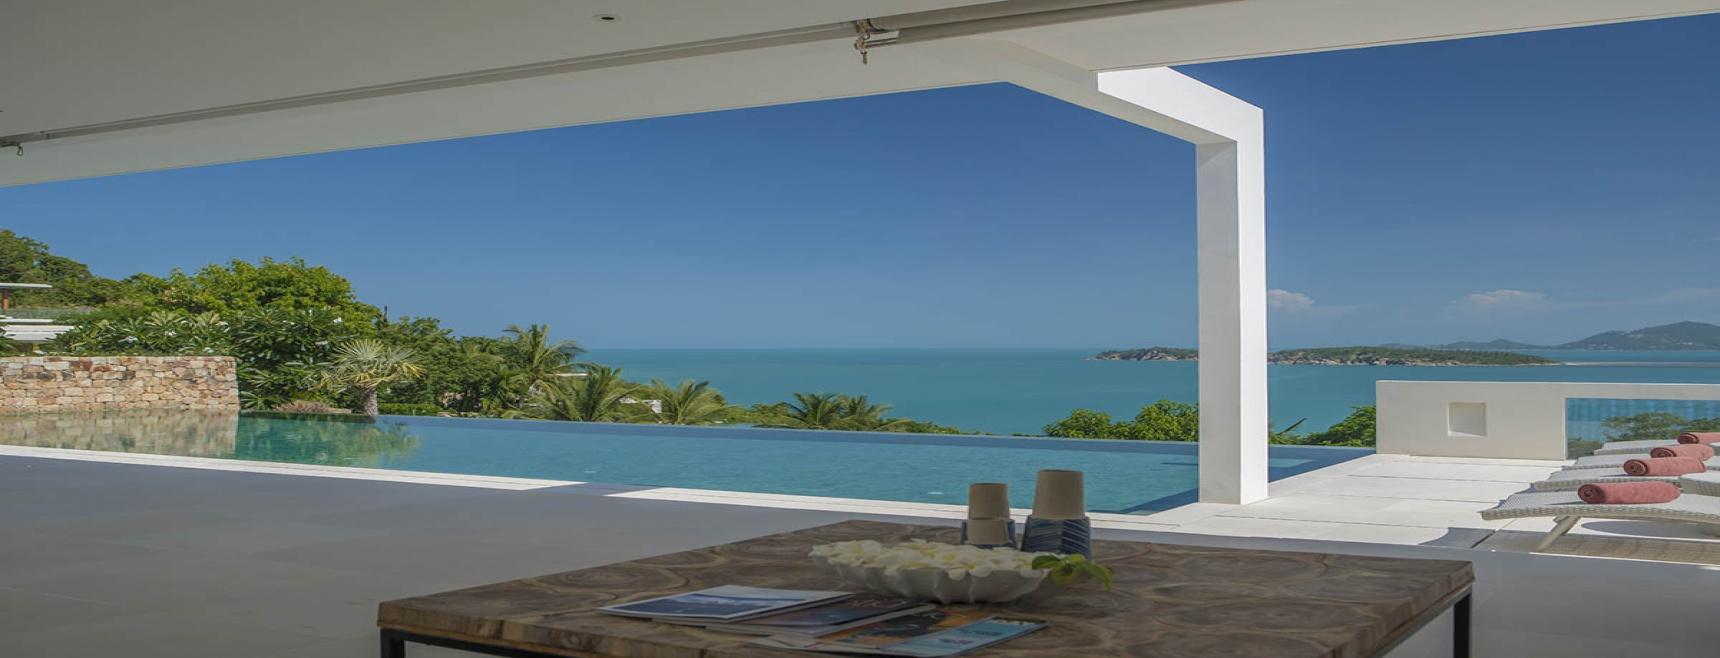 Koh Samui, luxury, property, real estate, villa, Samujana estate